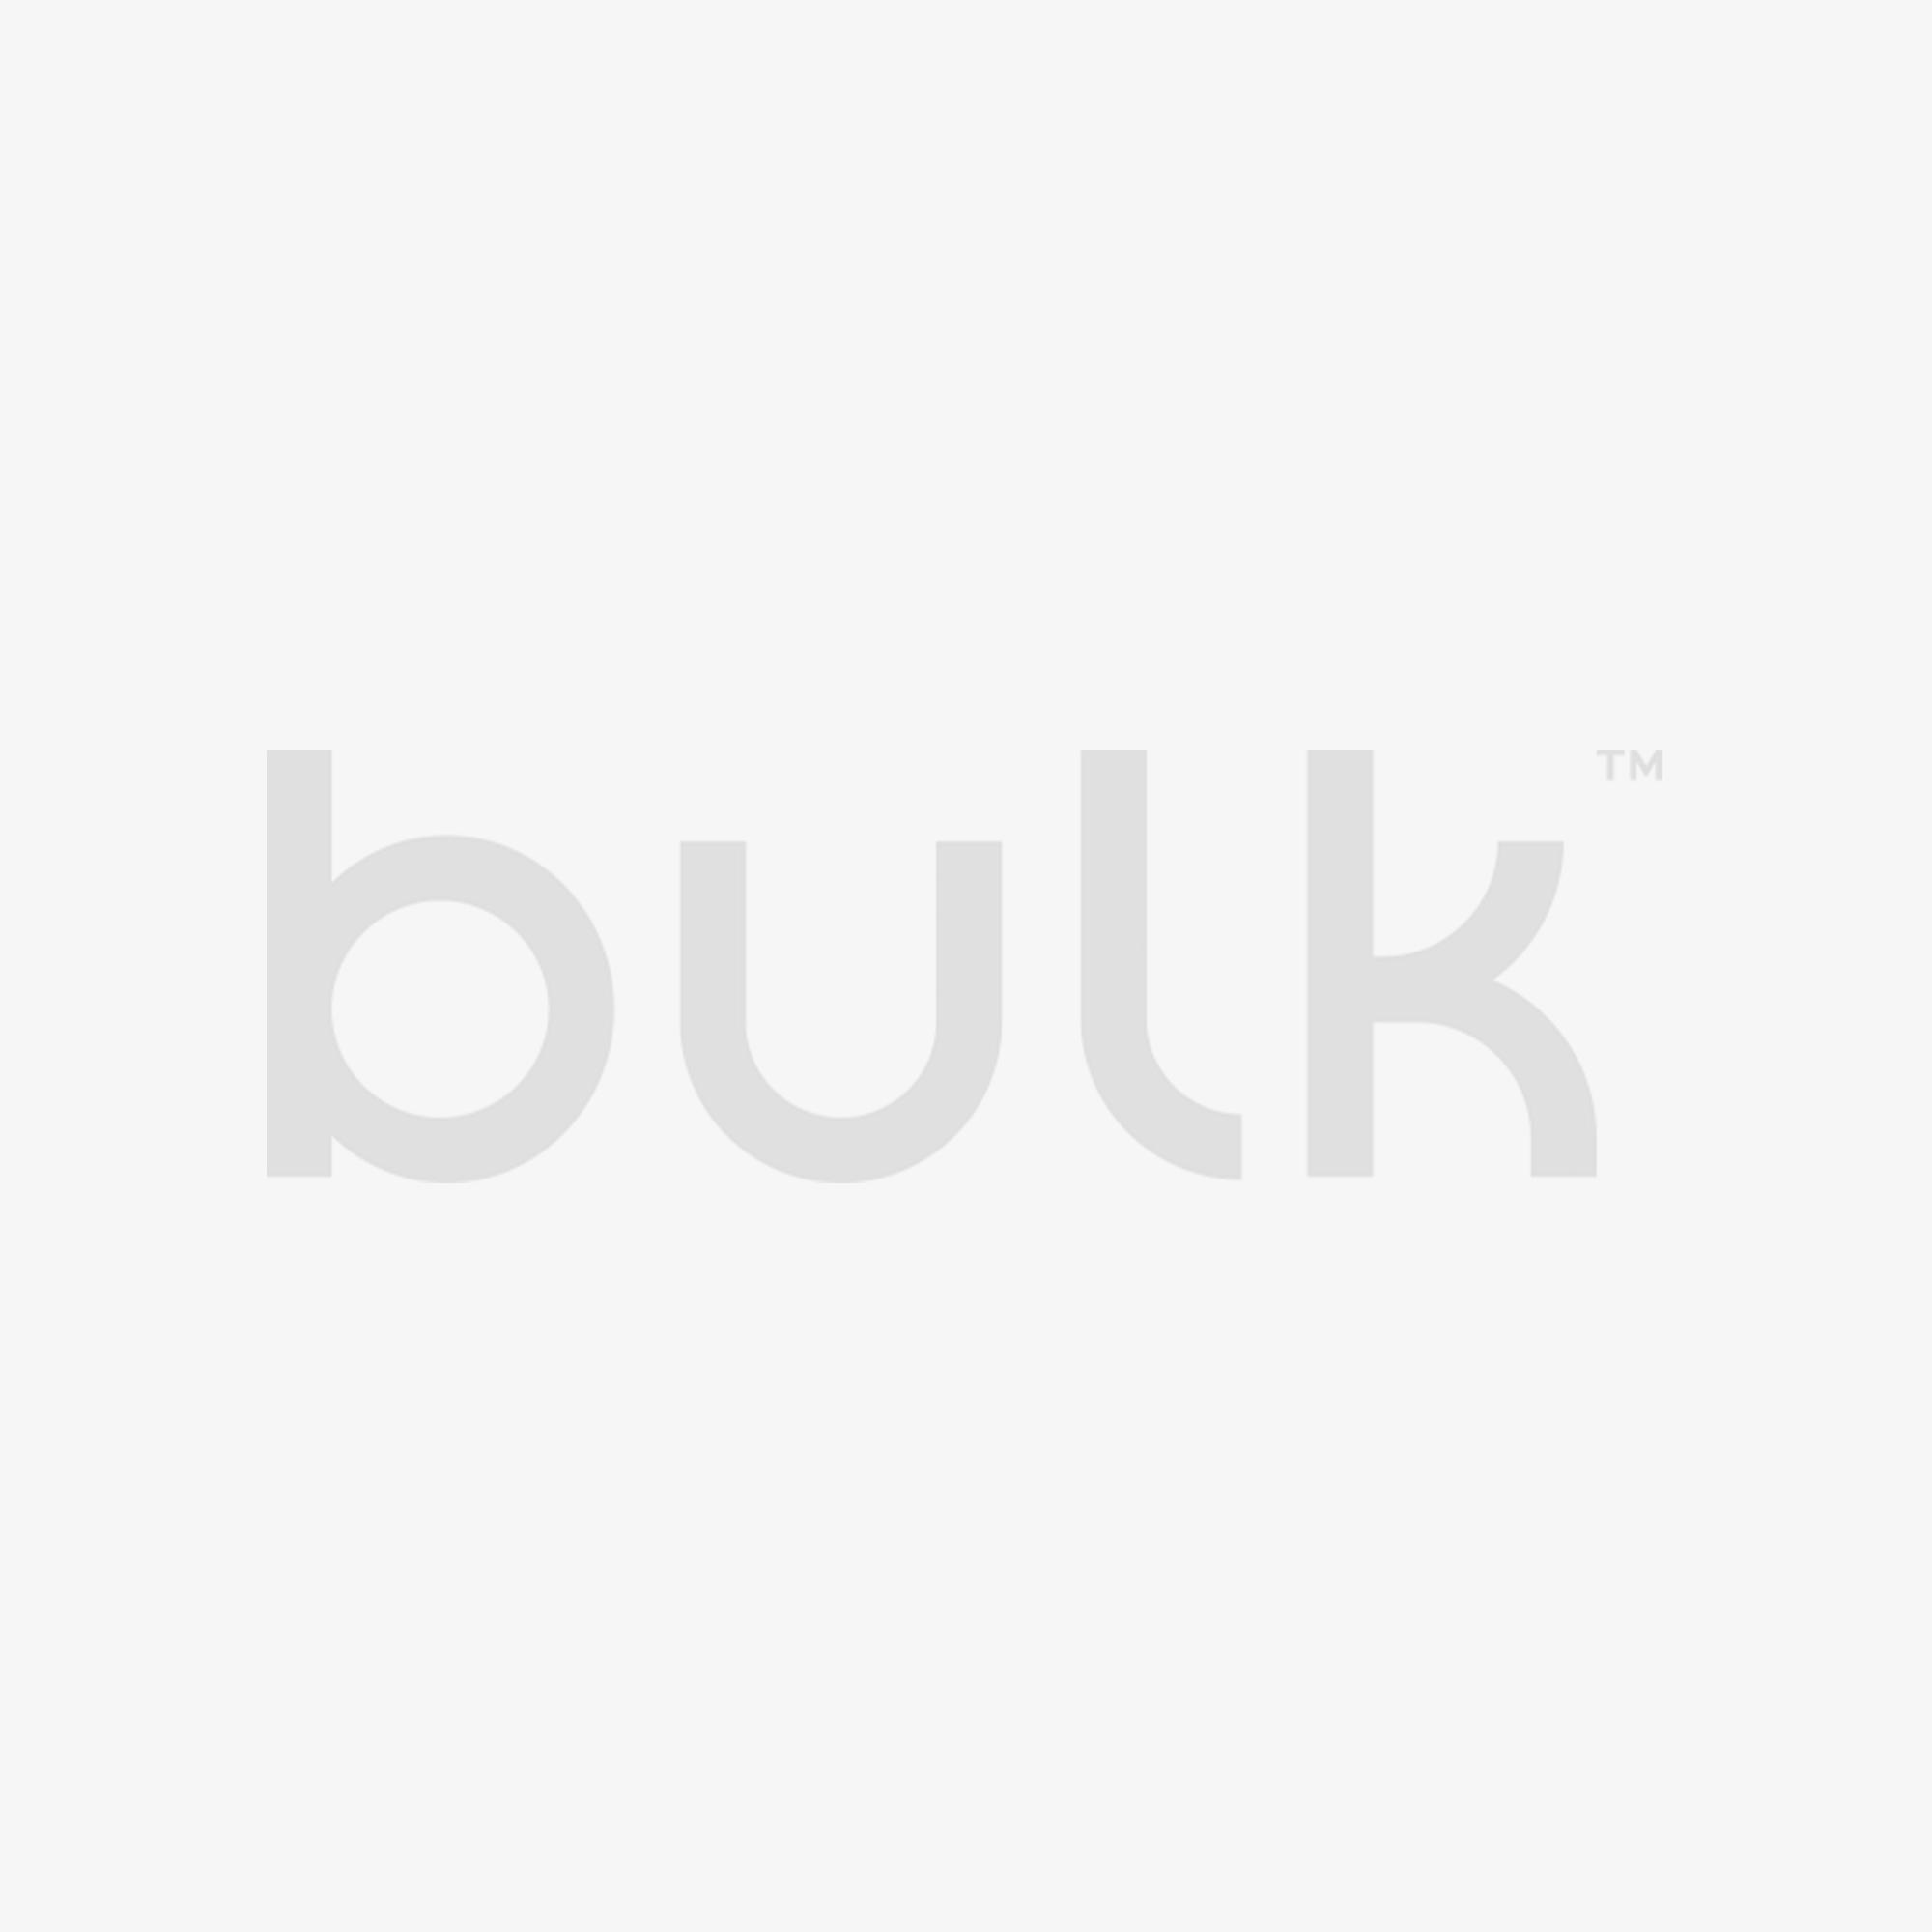 Kollagenkaffe